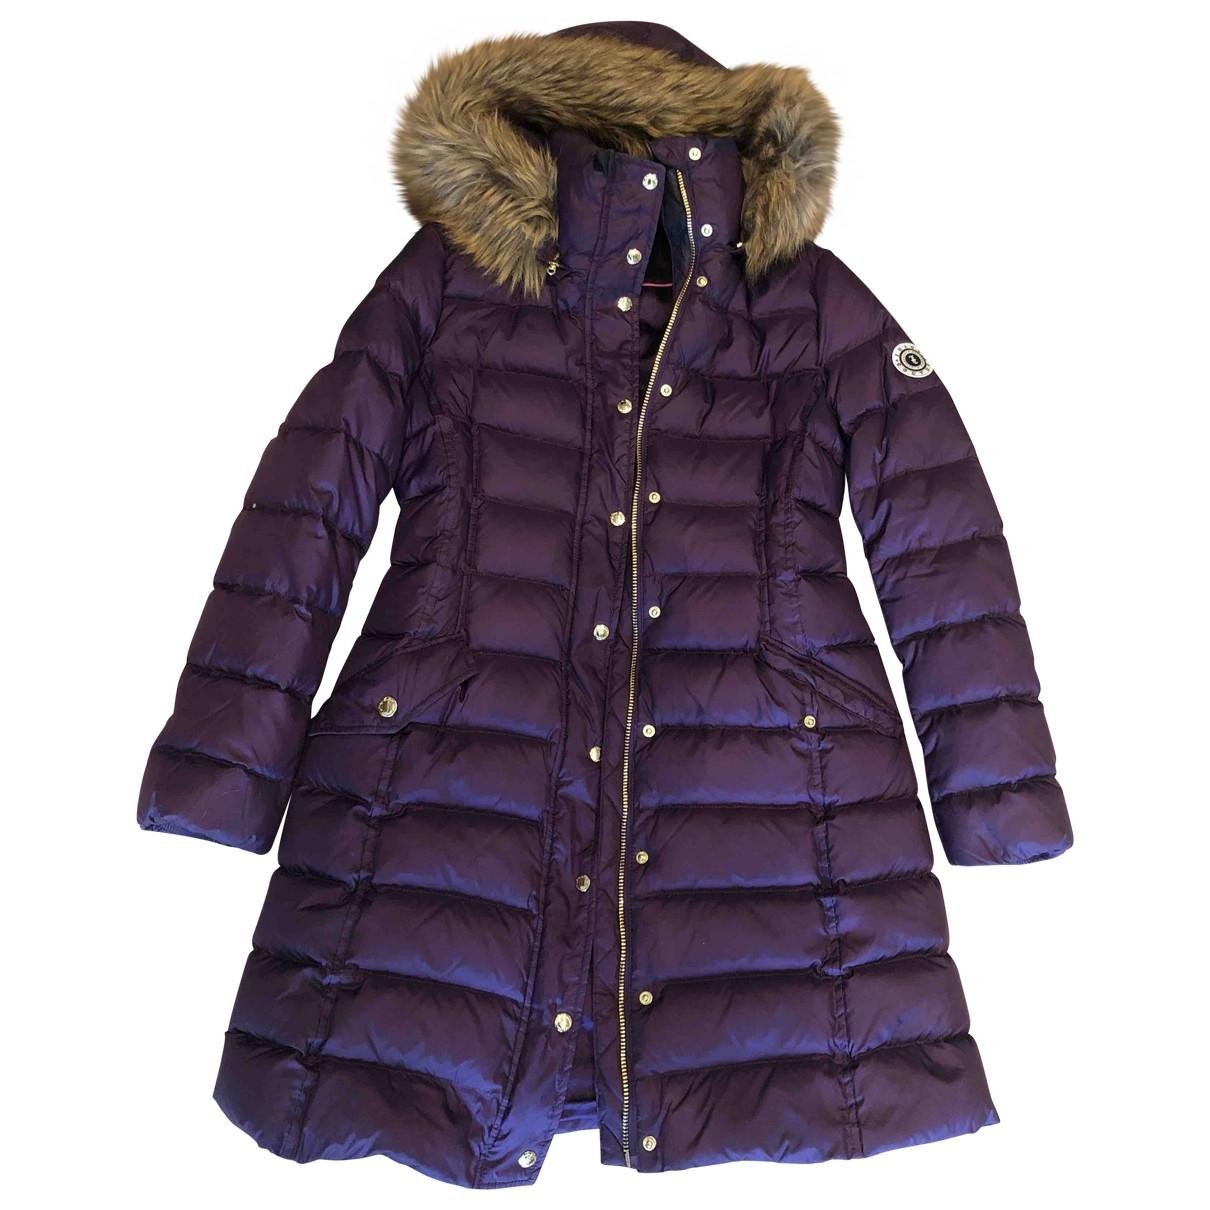 Juicy Couture \N Purple coat for Women L International